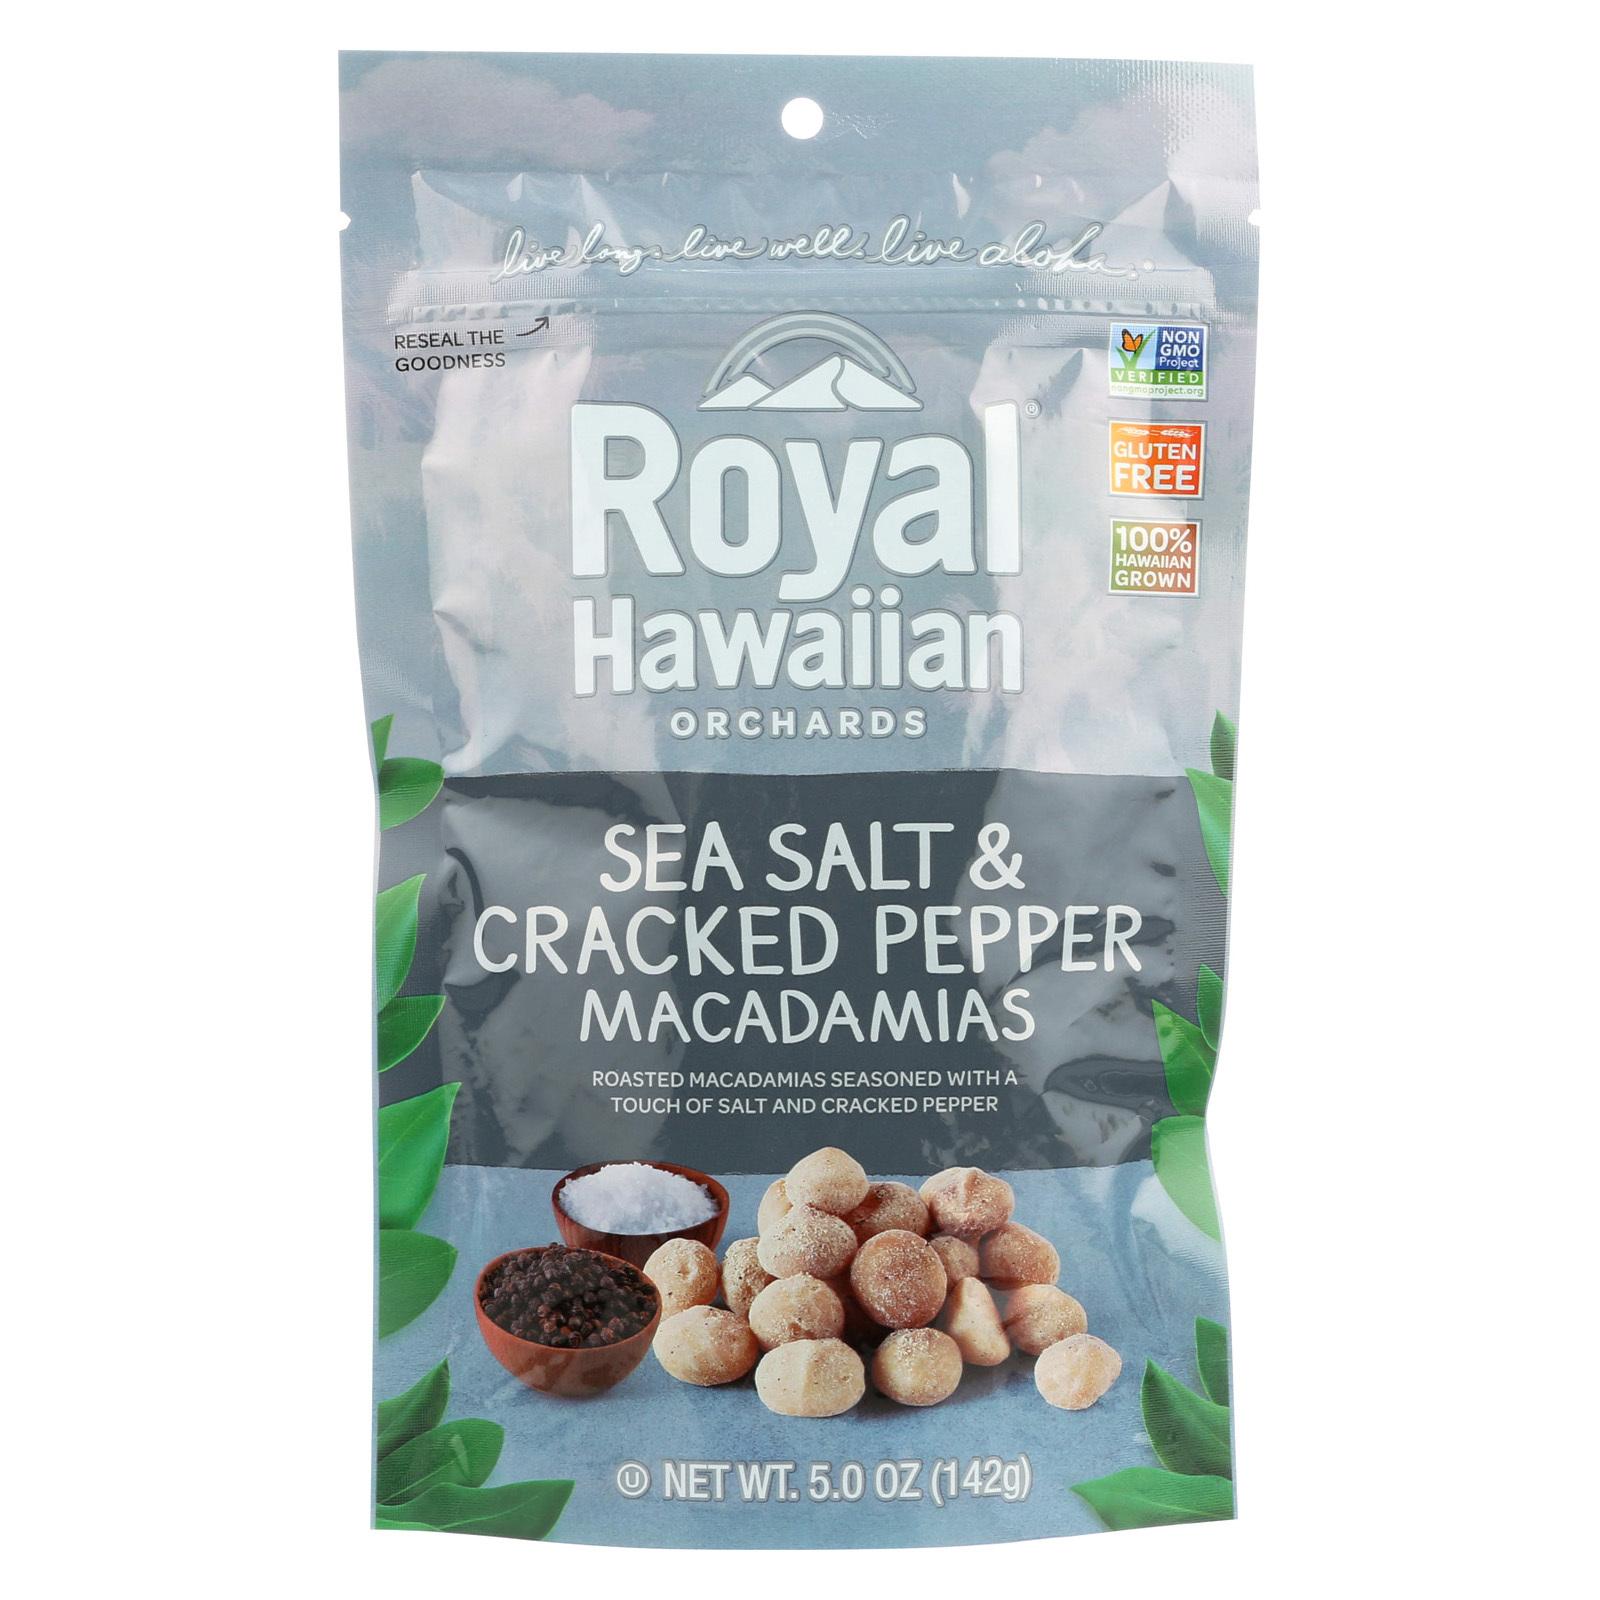 Royal Hawaiian Orchards Macadamias - Sea Salt and Cracked Pepper - Case of 6 - 5 oz.